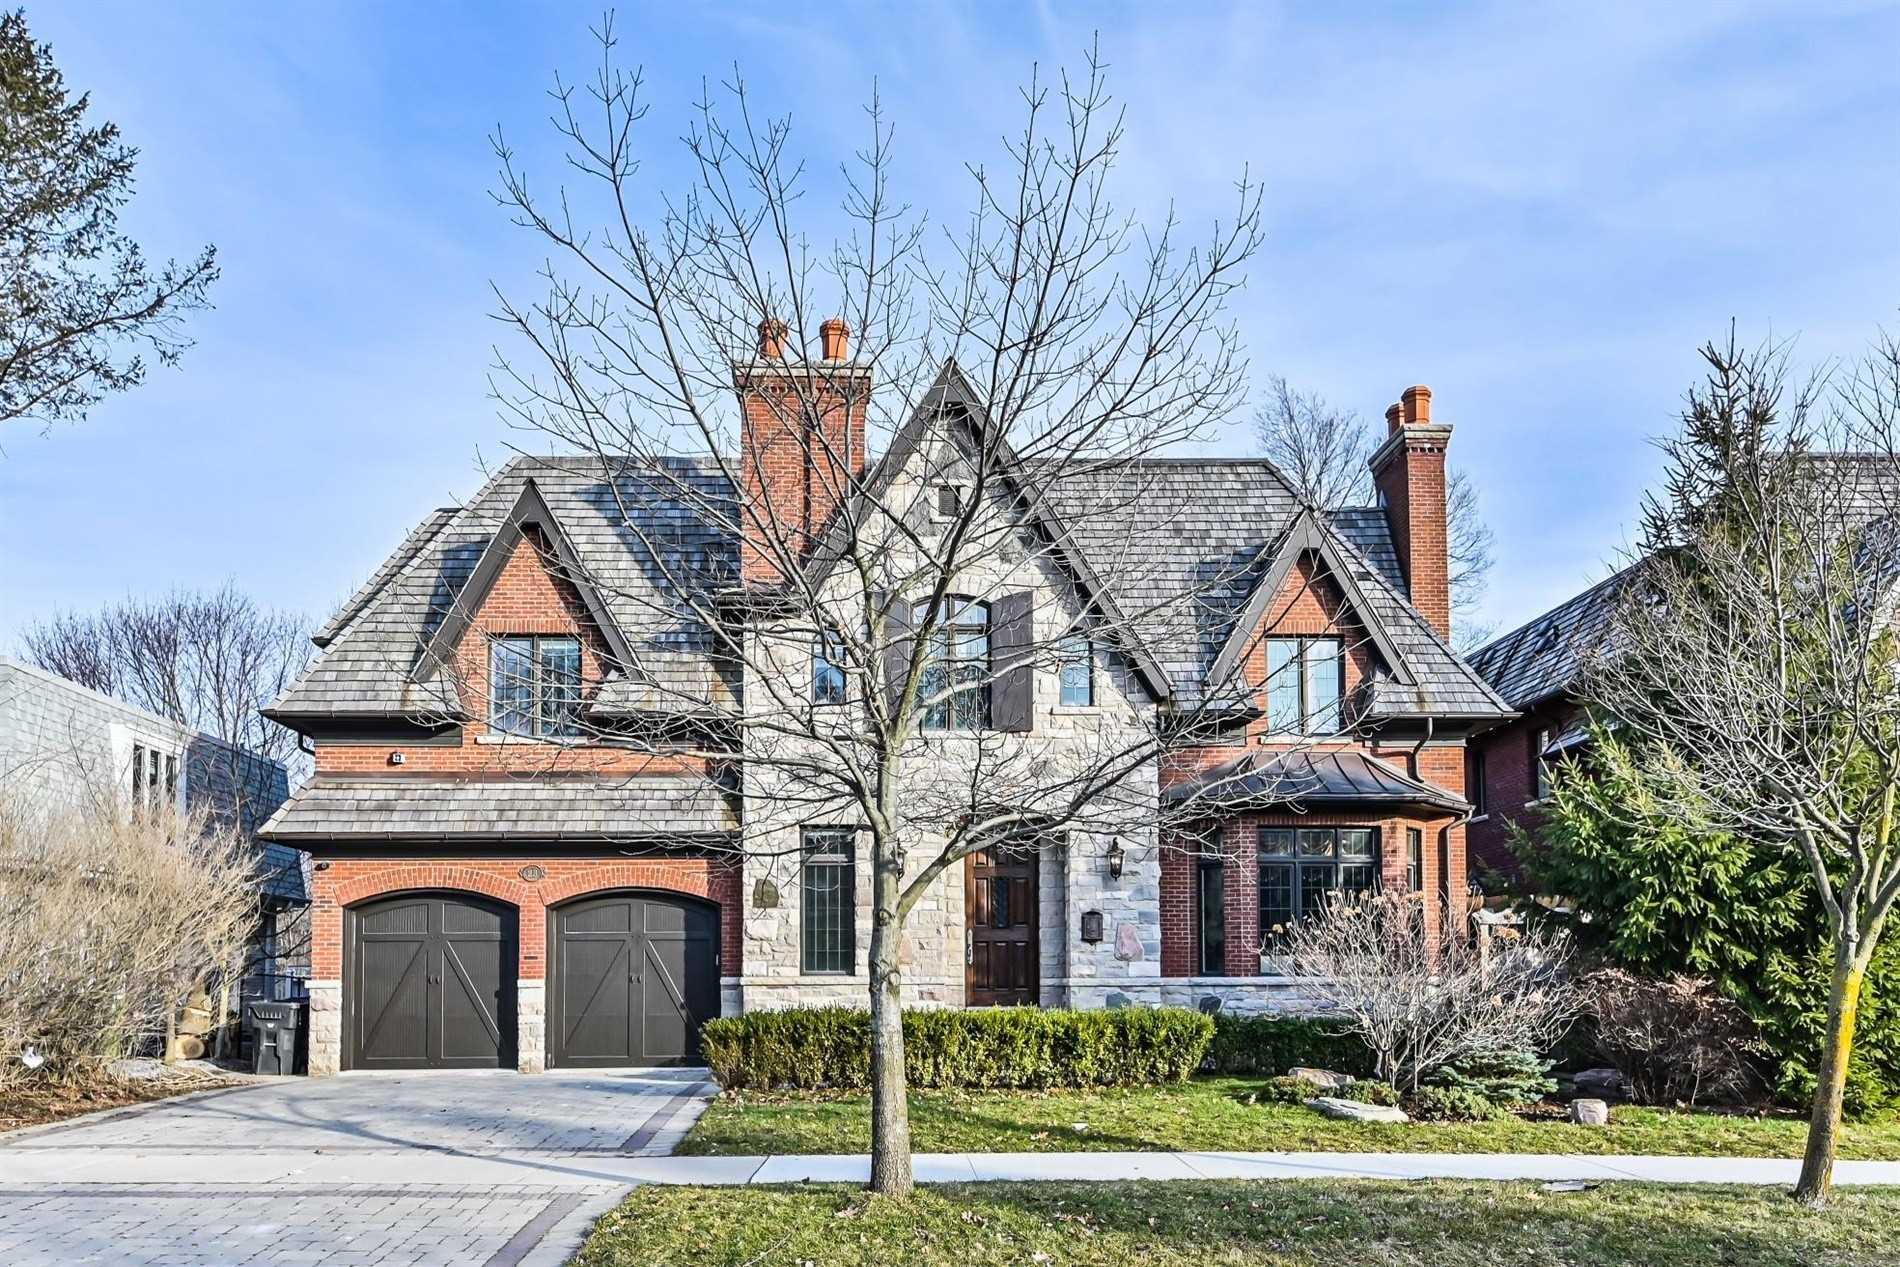 23 Montressor Dr, Toronto, Ontario M2P1Y9, 5 Bedrooms Bedrooms, 10 Rooms Rooms,8 BathroomsBathrooms,Detached,For Sale,Montressor,C4820729